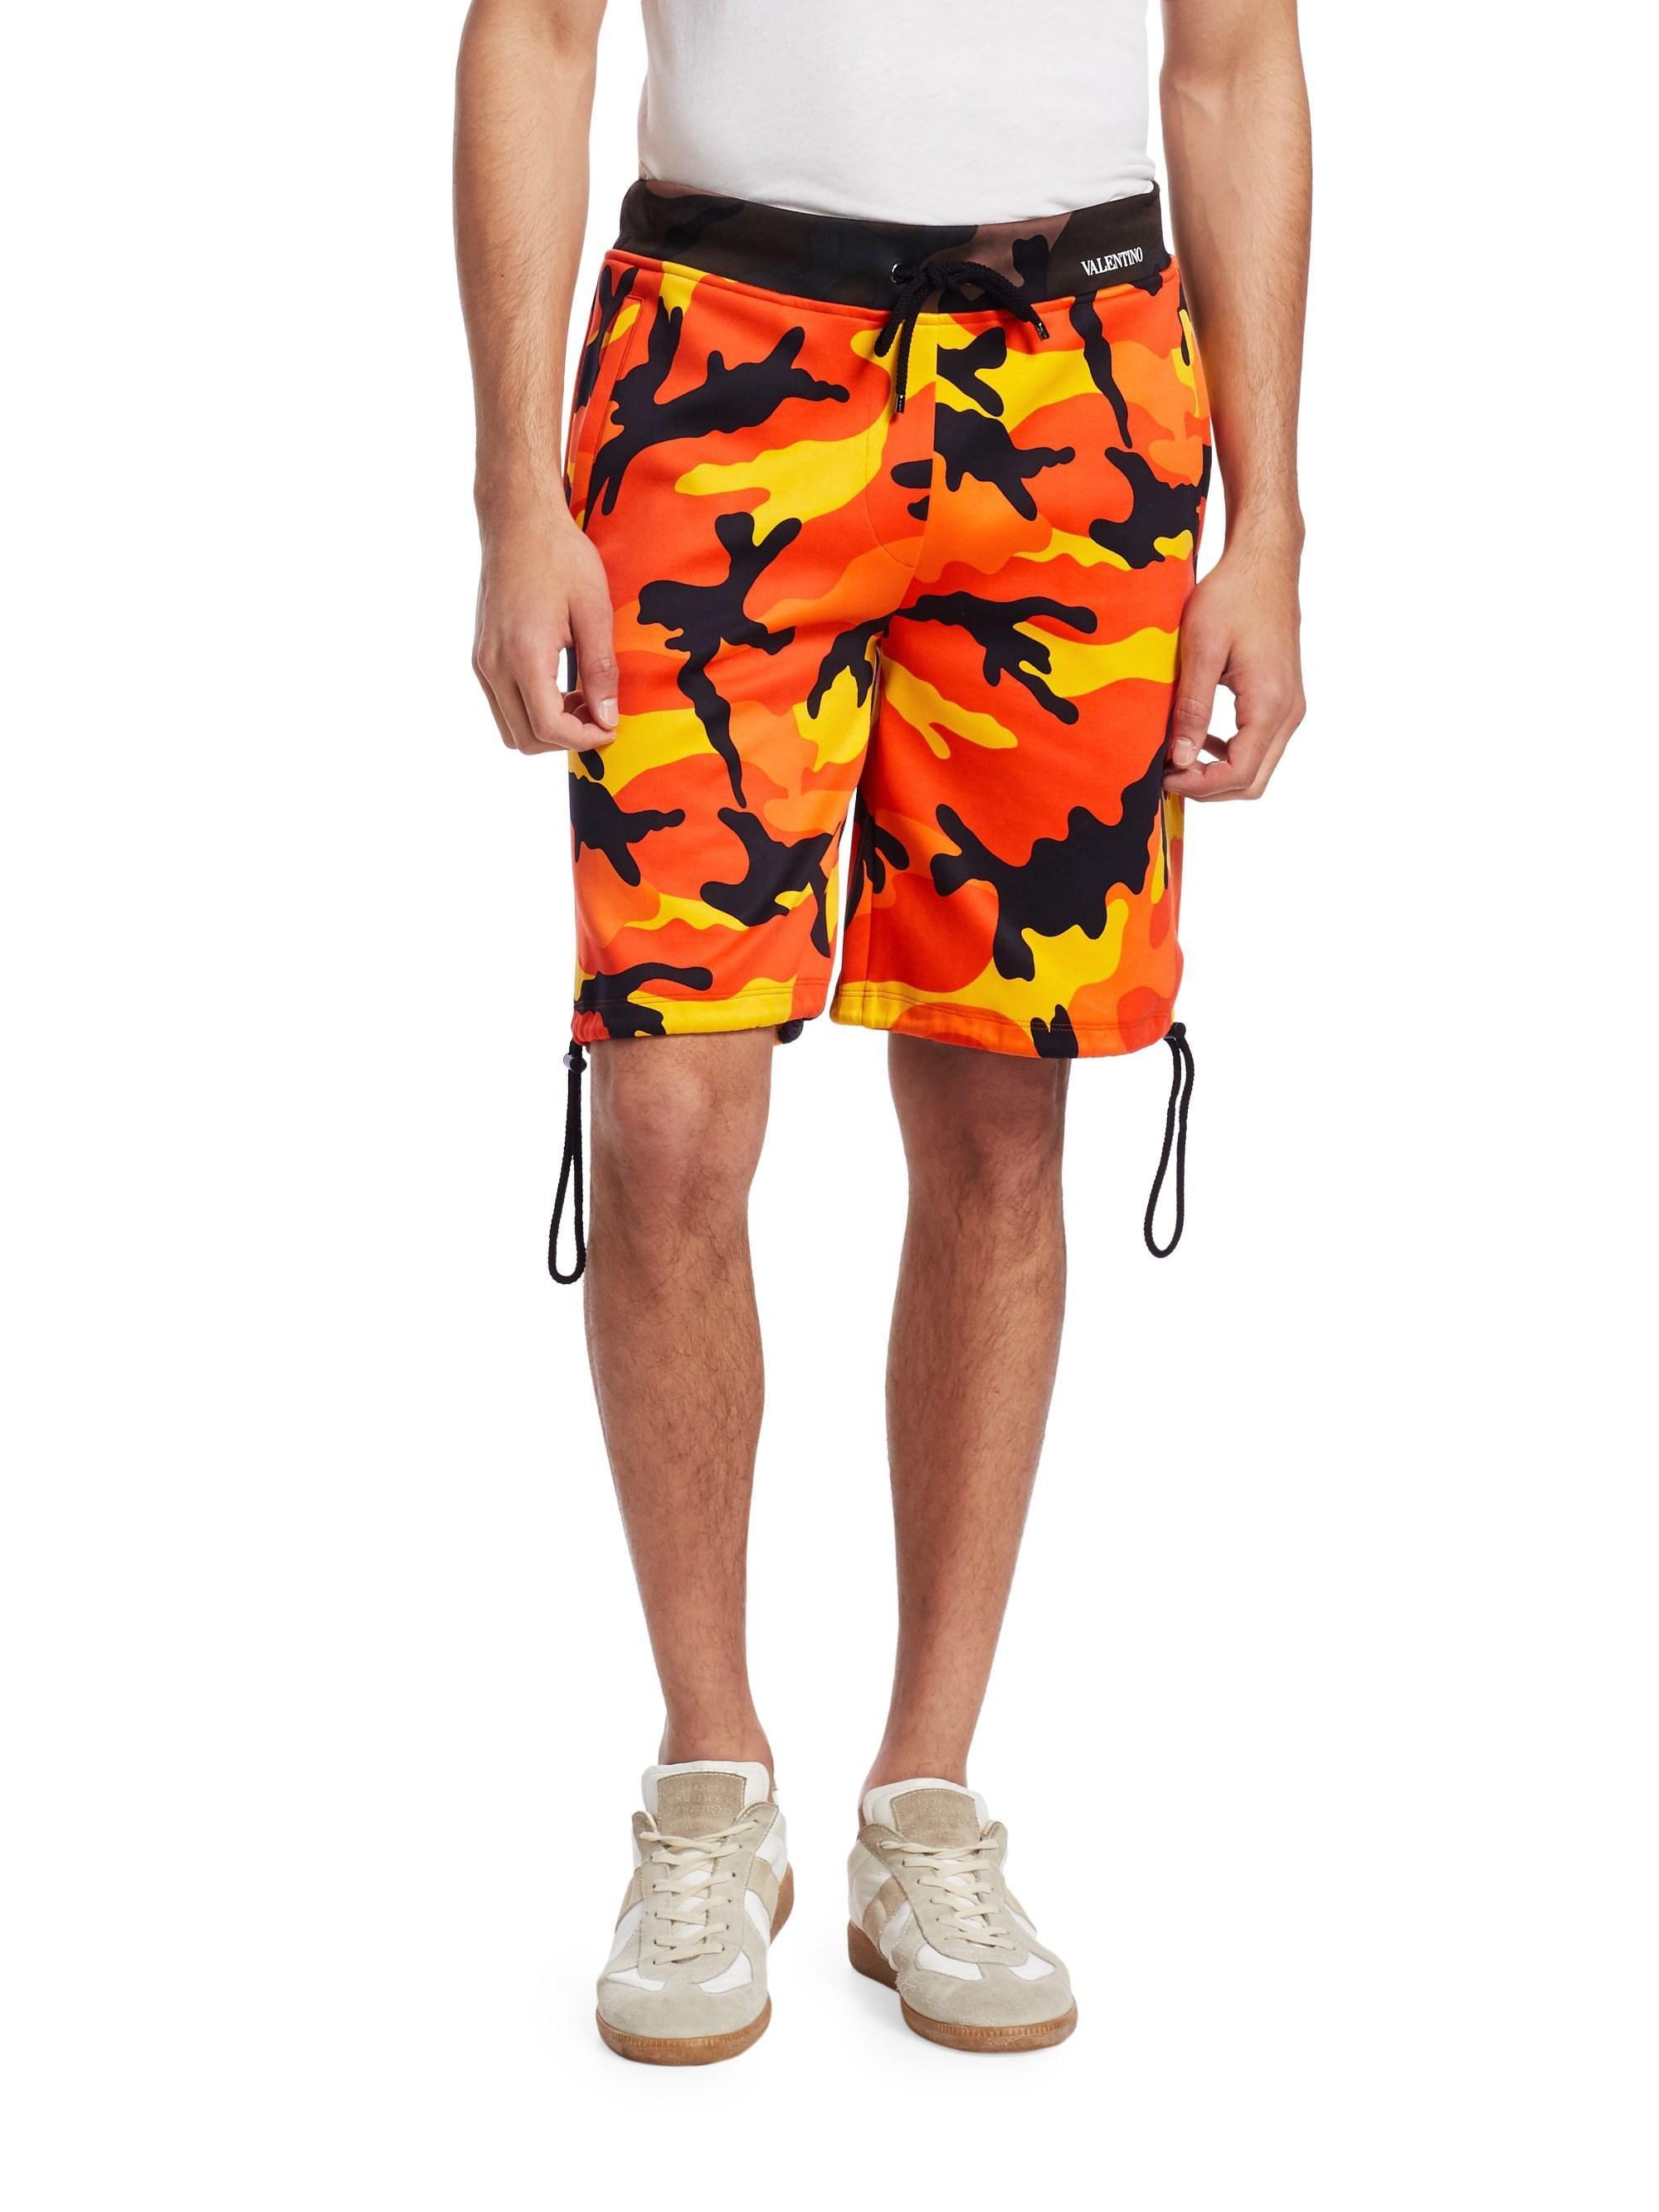 Valentino Men s Camouflage Classic Shorts - Orange Camo - Size Large ... 016566fd506